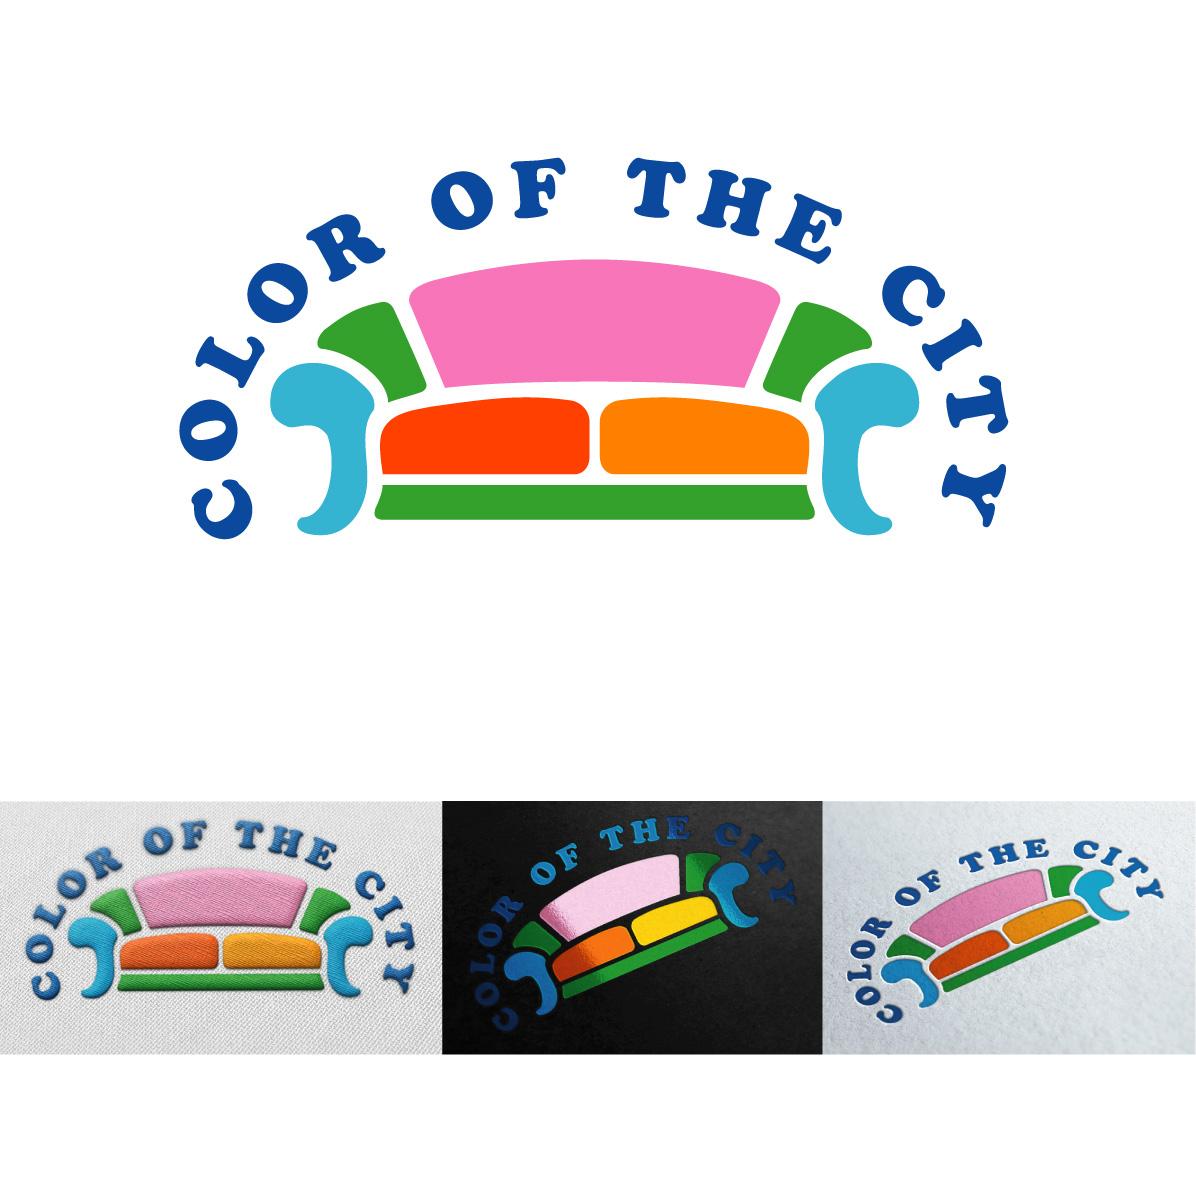 Необходим логотип для сети хостелов фото f_84351a77afcd61b8.jpg